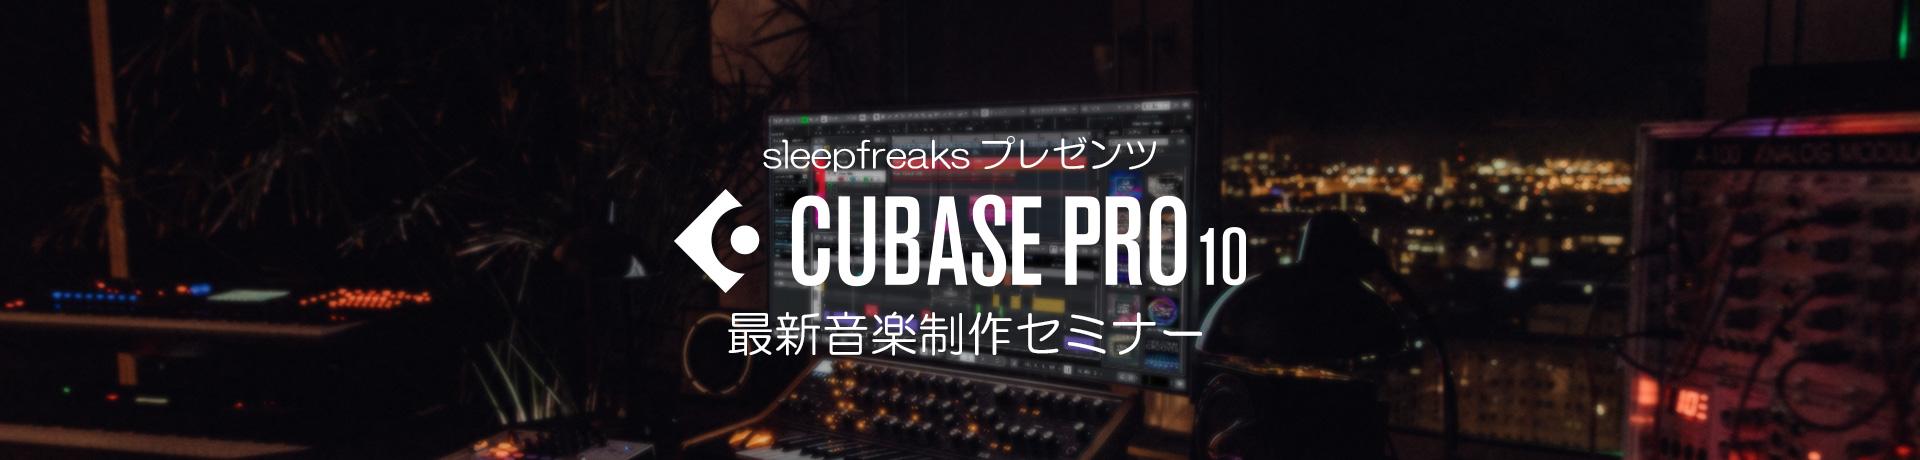 sleepfreaks-cubase-seminar2-banner